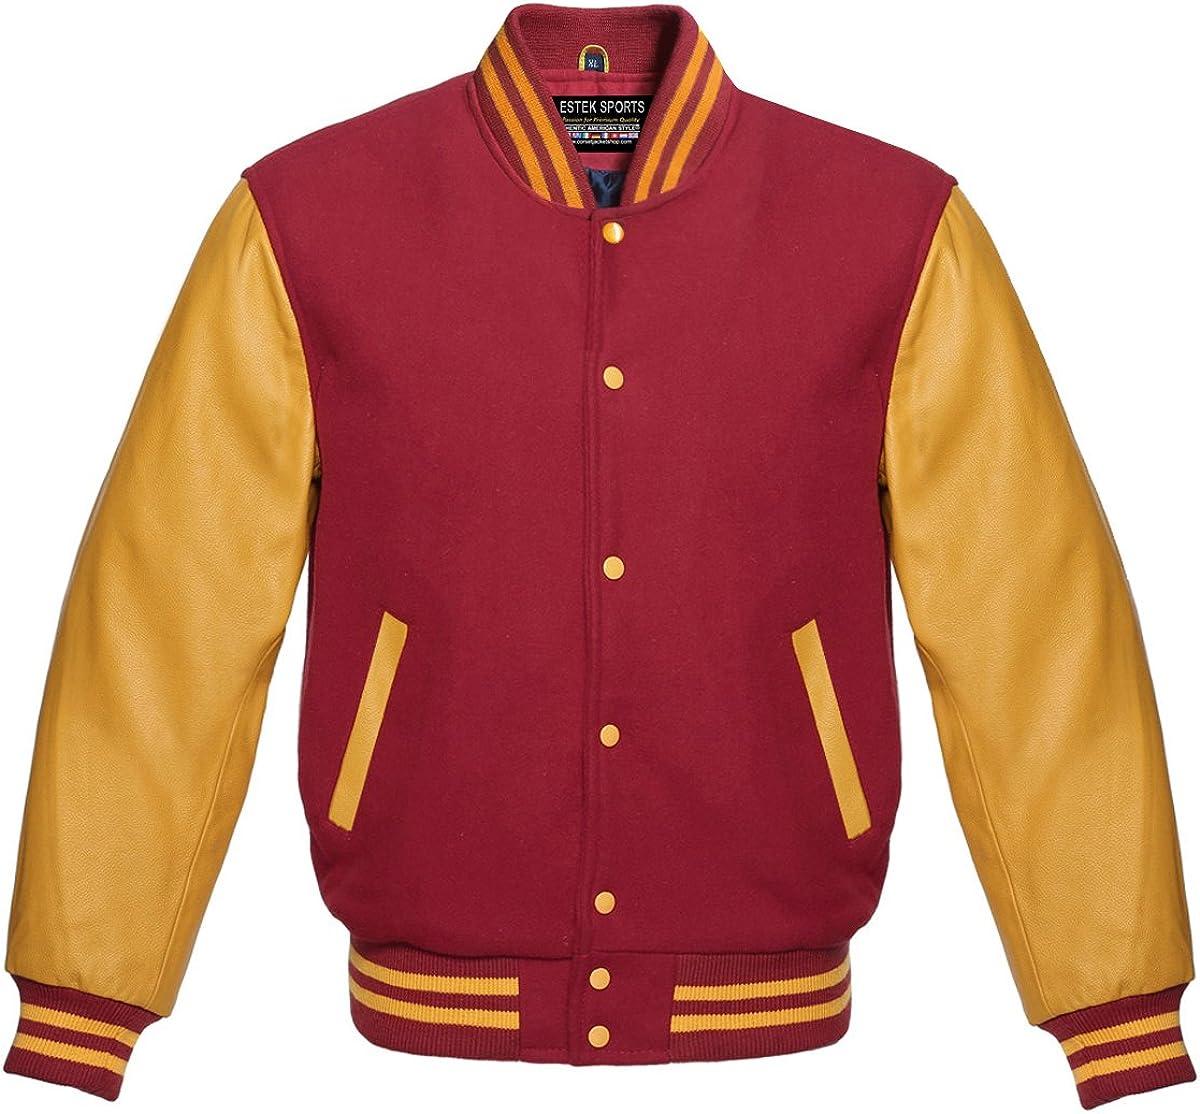 Authentic American Varsity Letterman Jacket Maroon Wool Blend & Genuine Gold Leather Sleeves College